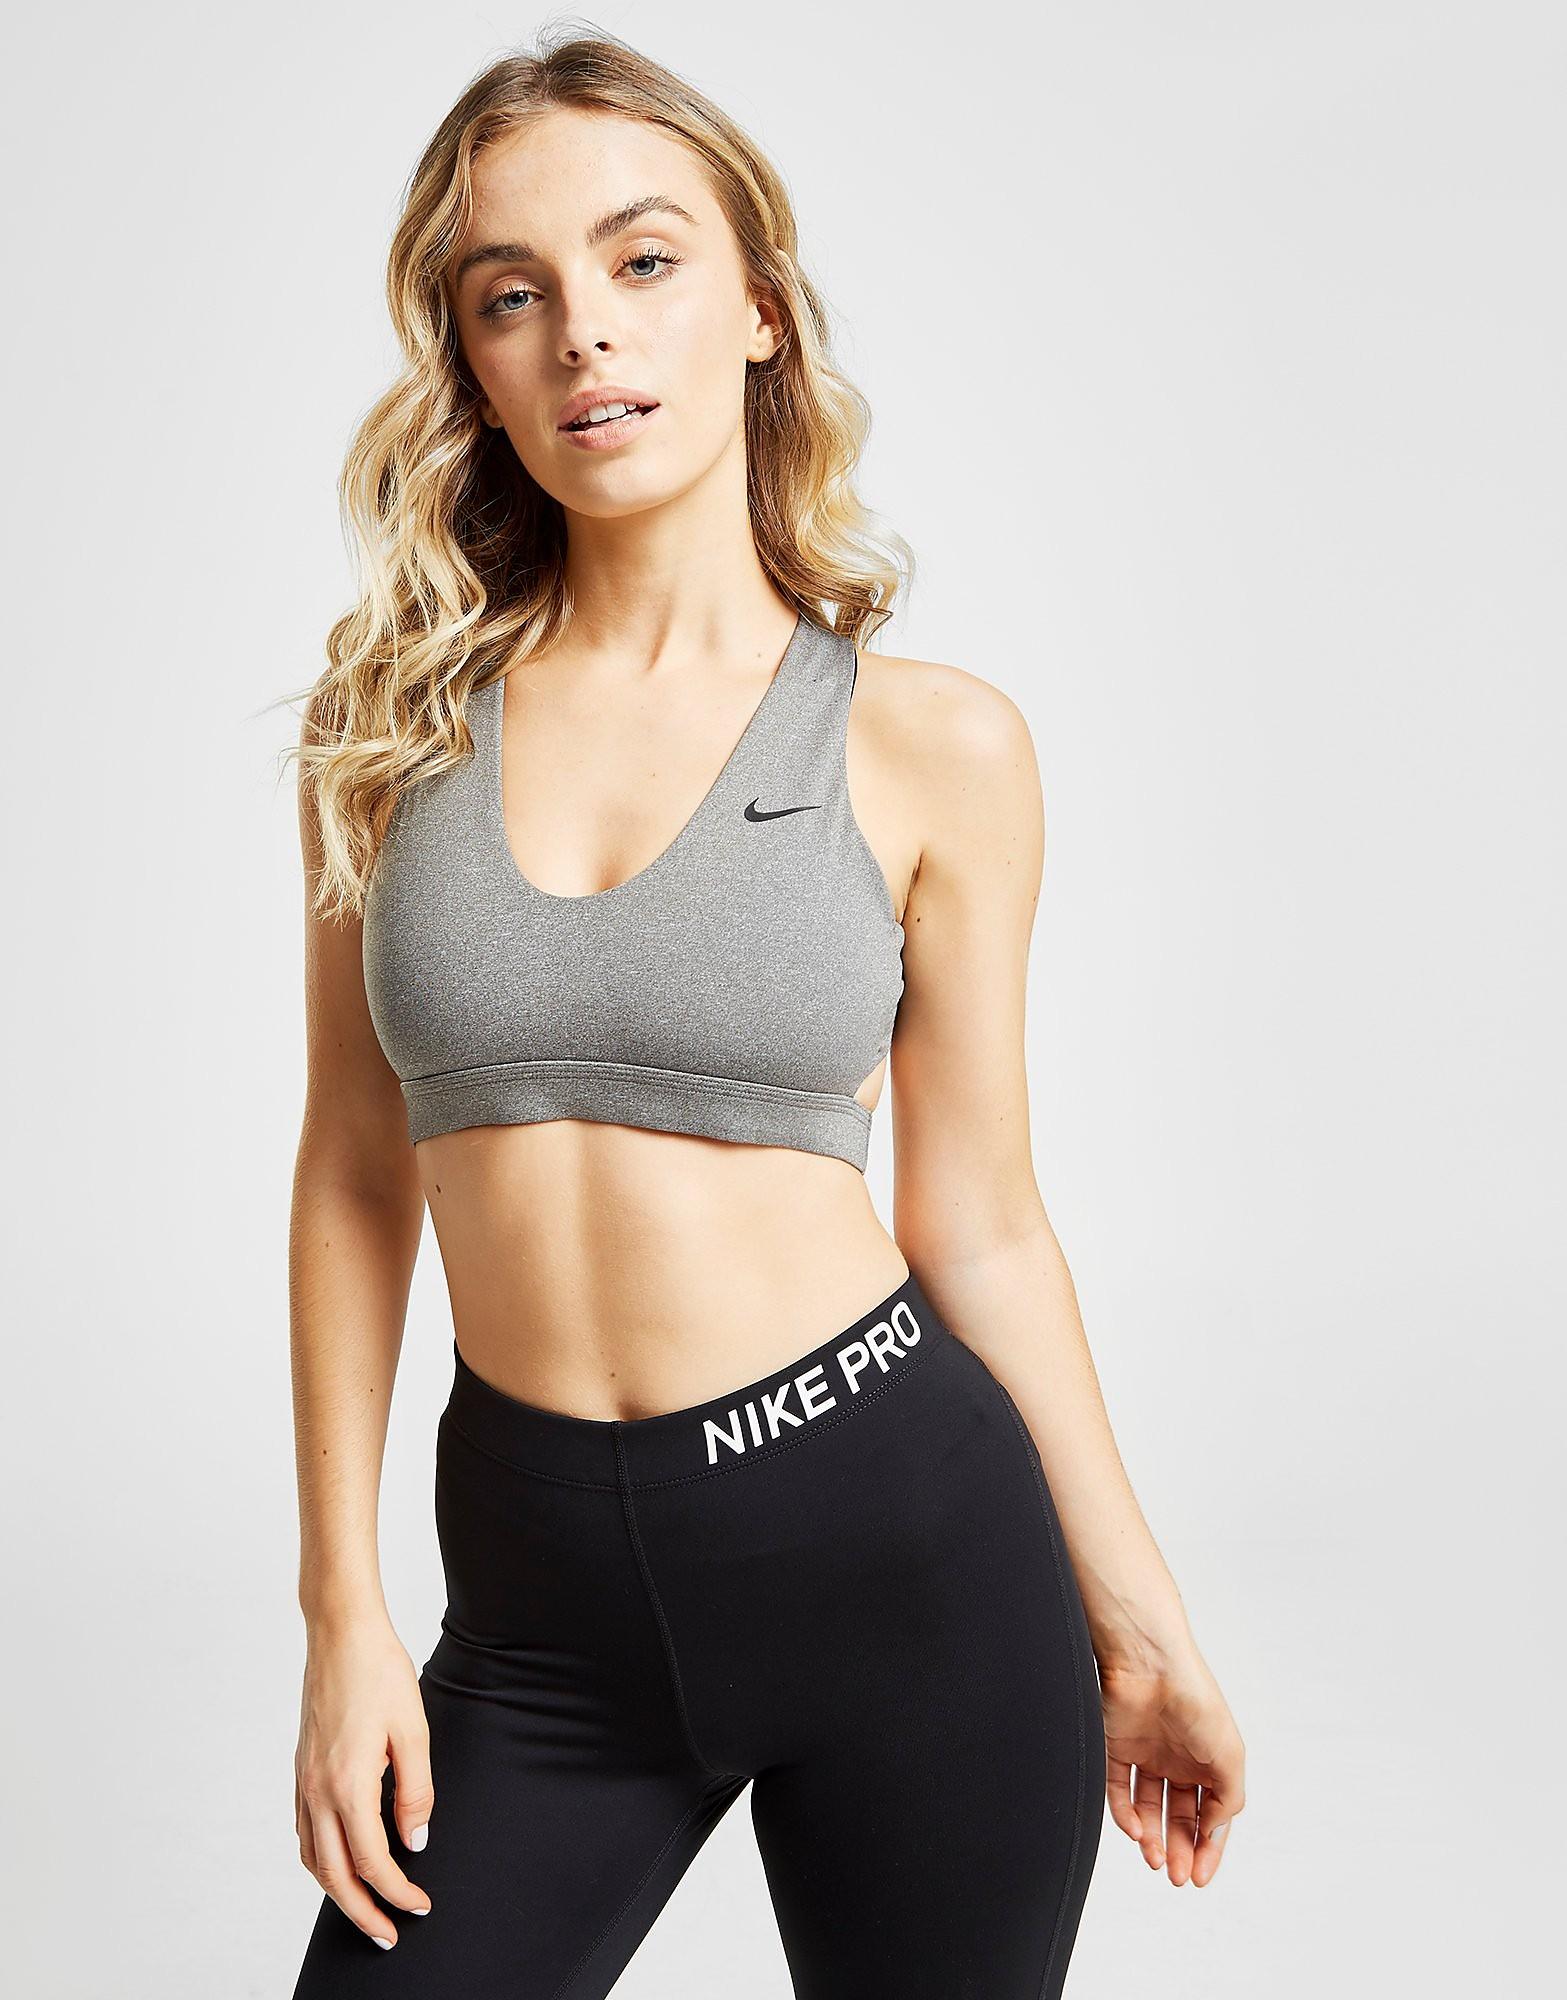 Nike Soutien-gorge Training Indy Logo Femme